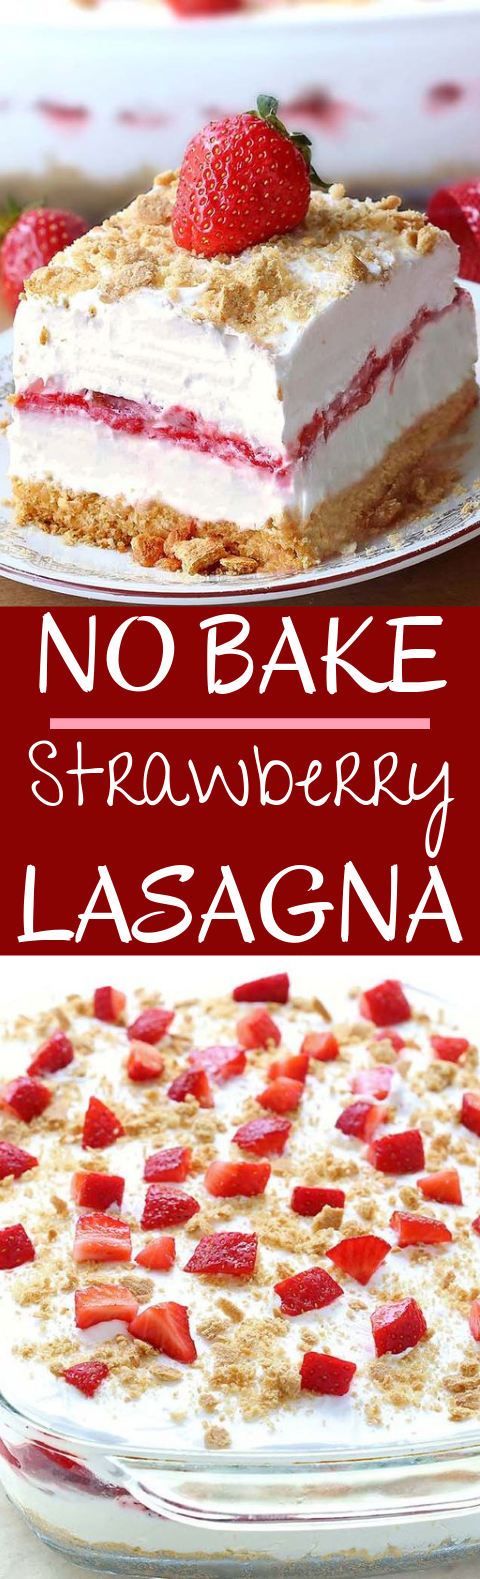 No Bake Strawberry Cheesecake Lasagna #desserts #nobake